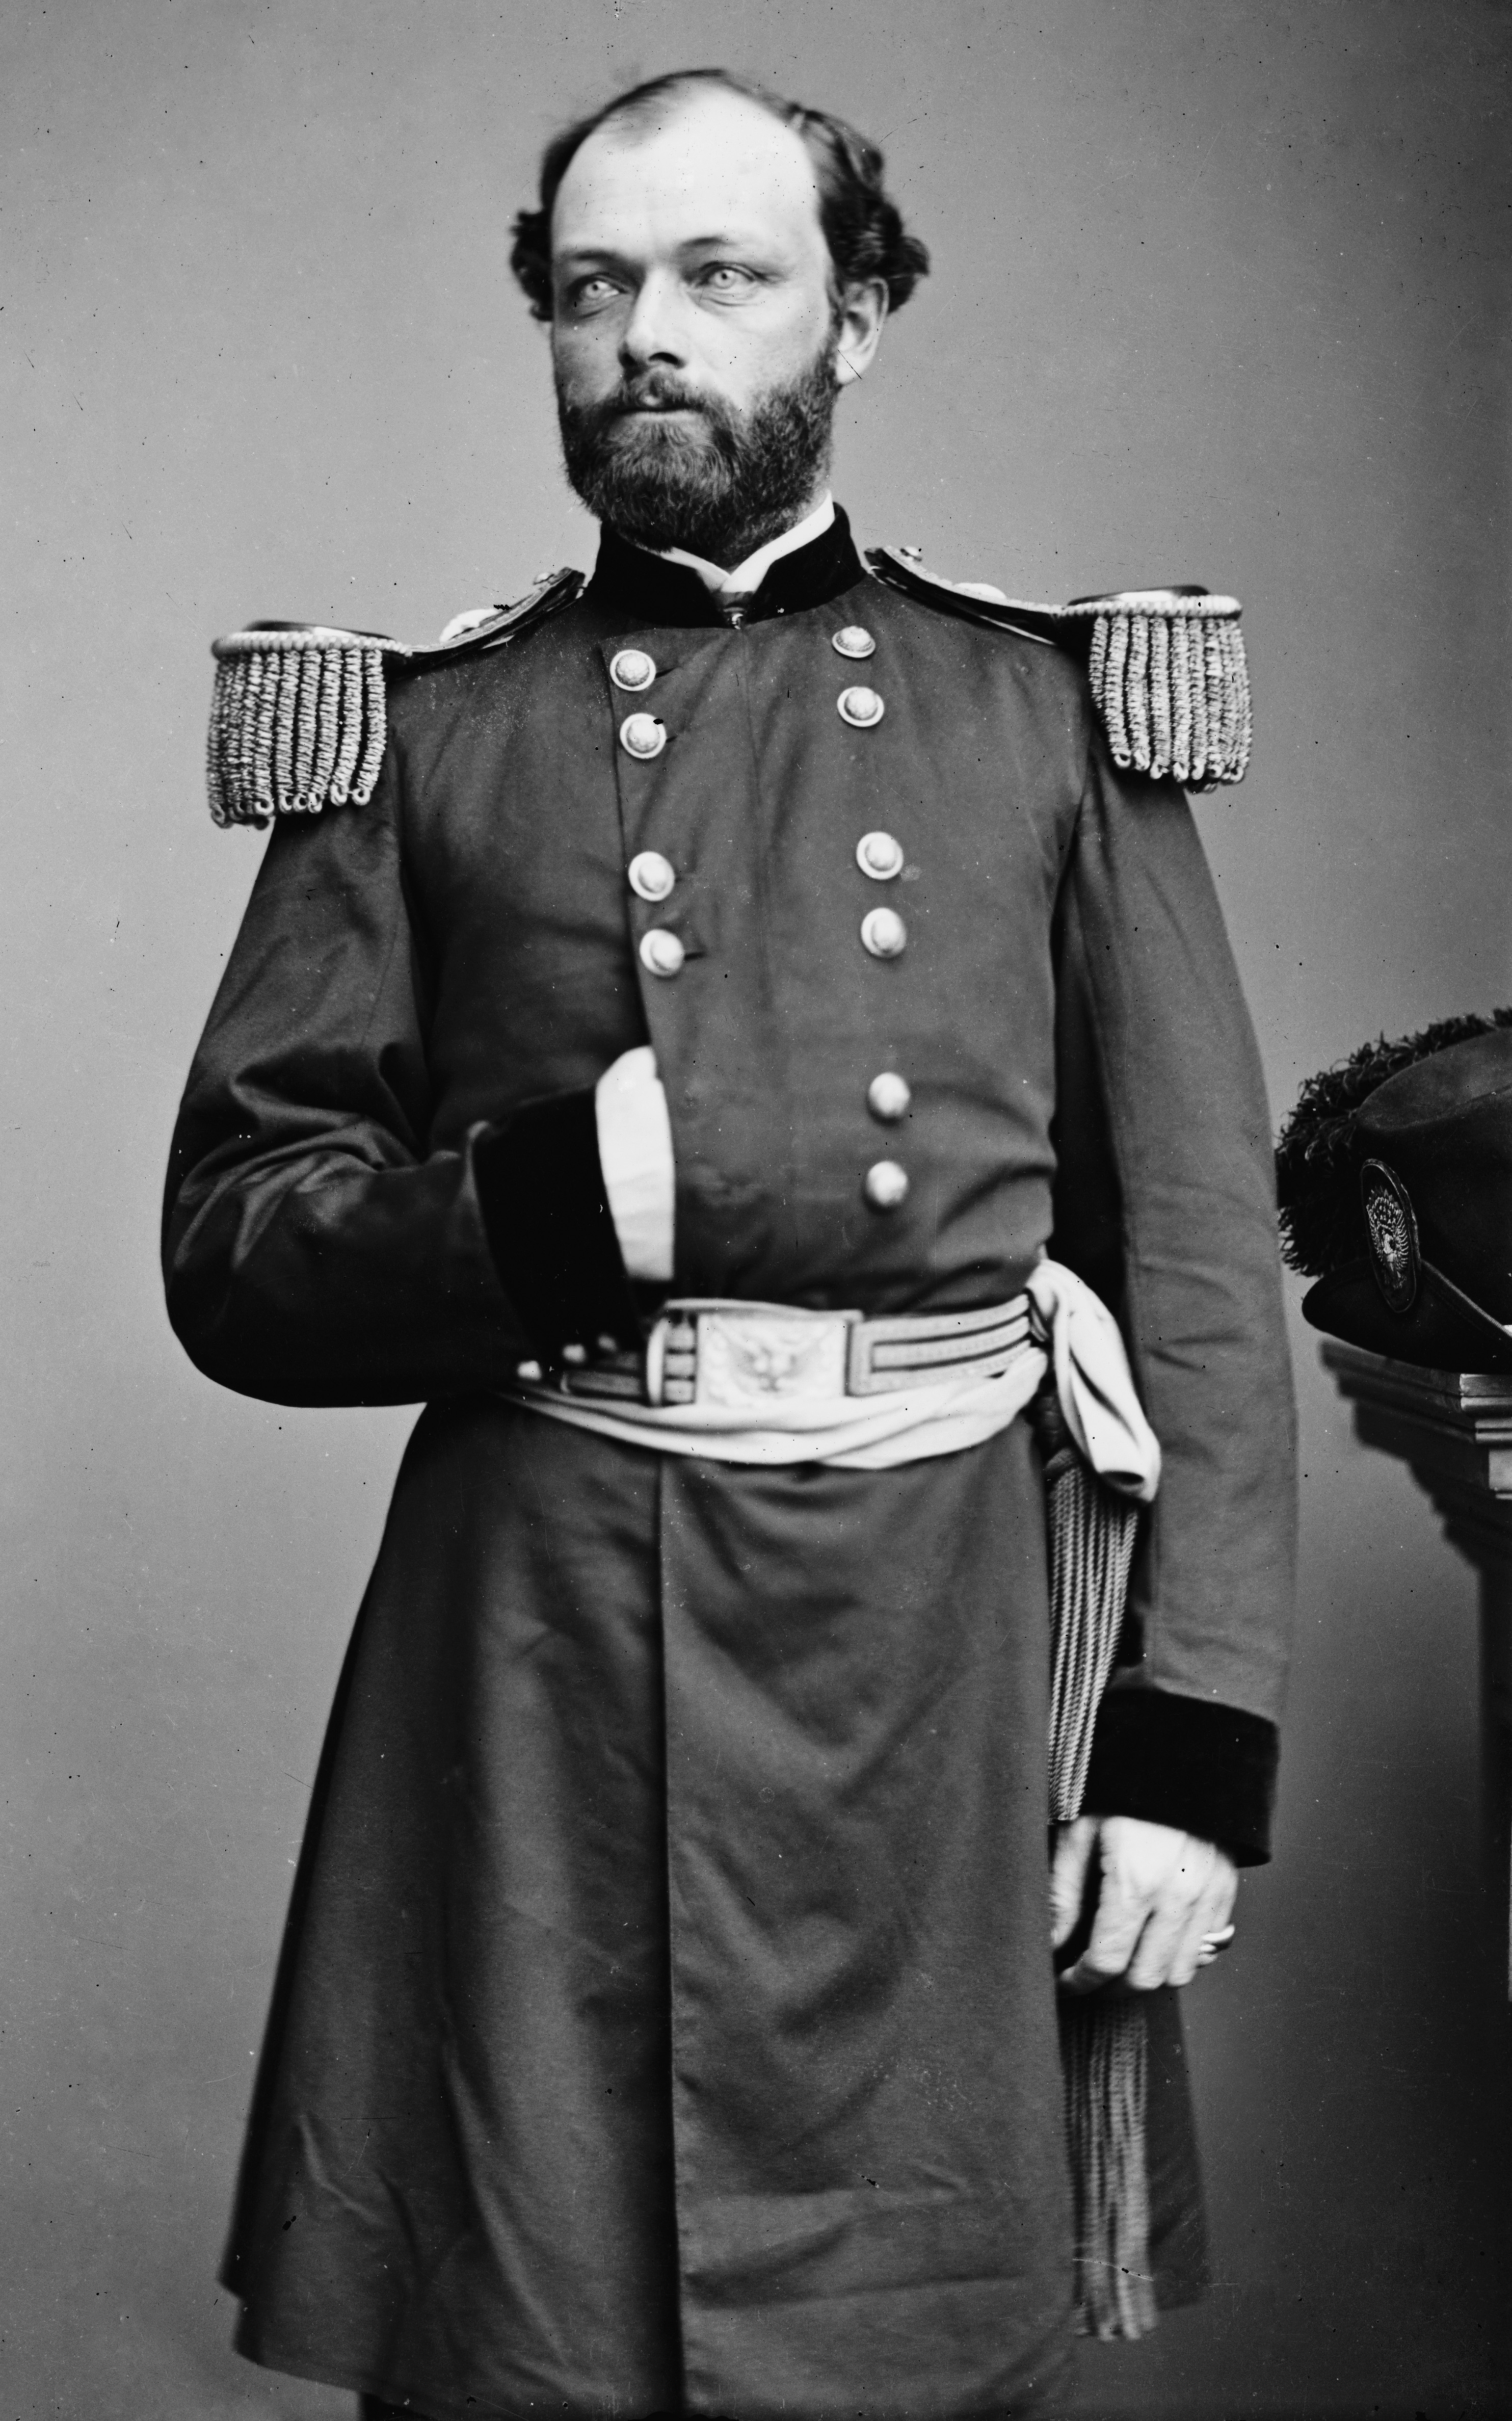 Civil War&ndash&#x3B;era portrait of Gillmore